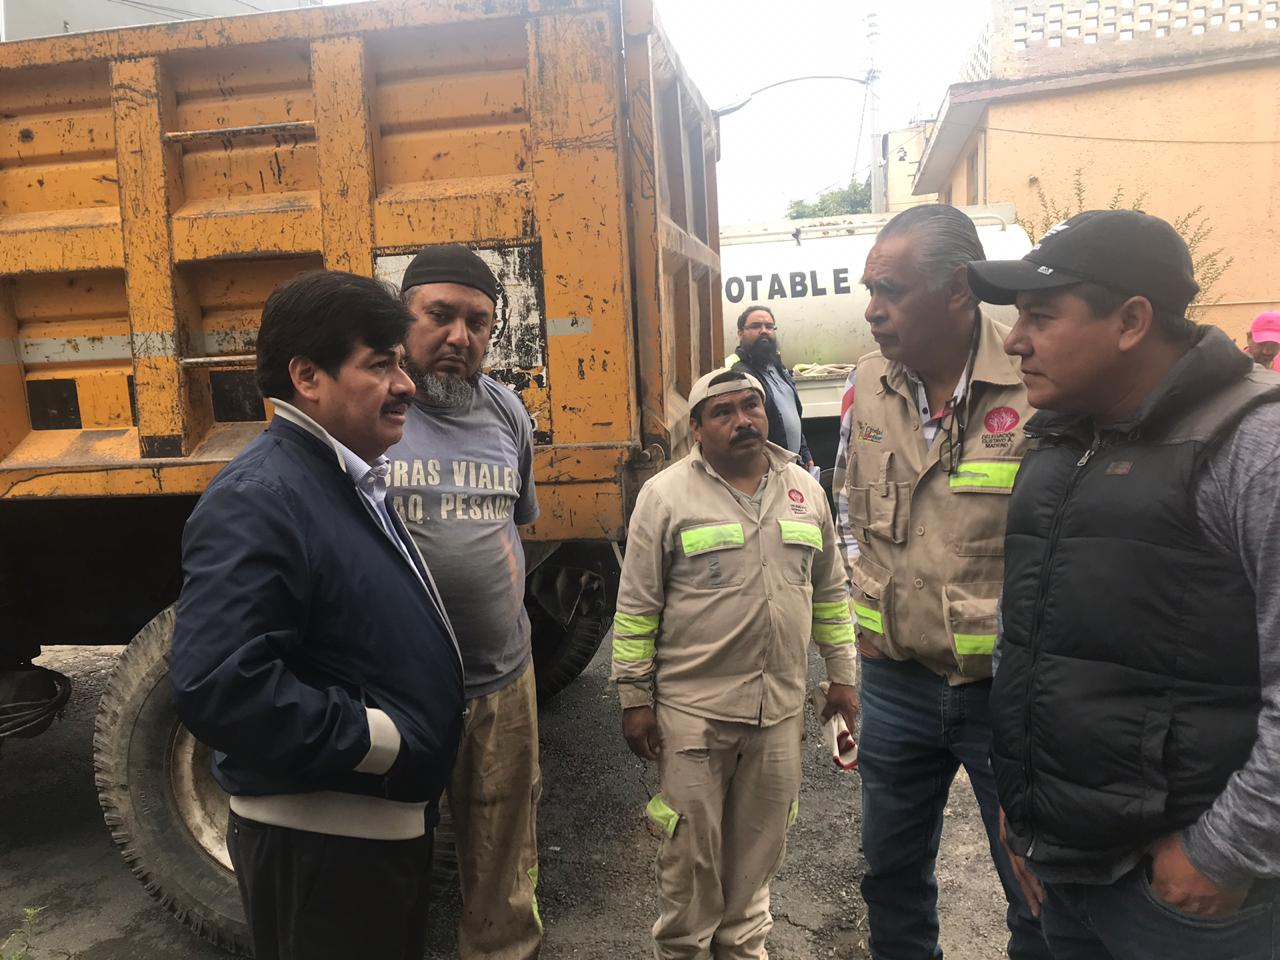 ENCABEZA FRANCISCO CHÍGUIL PRIMERA MEGA JORNADA SABATINA EN SEGUNDA SECCIÓN DE SAN JUAN DE ARAGÓN